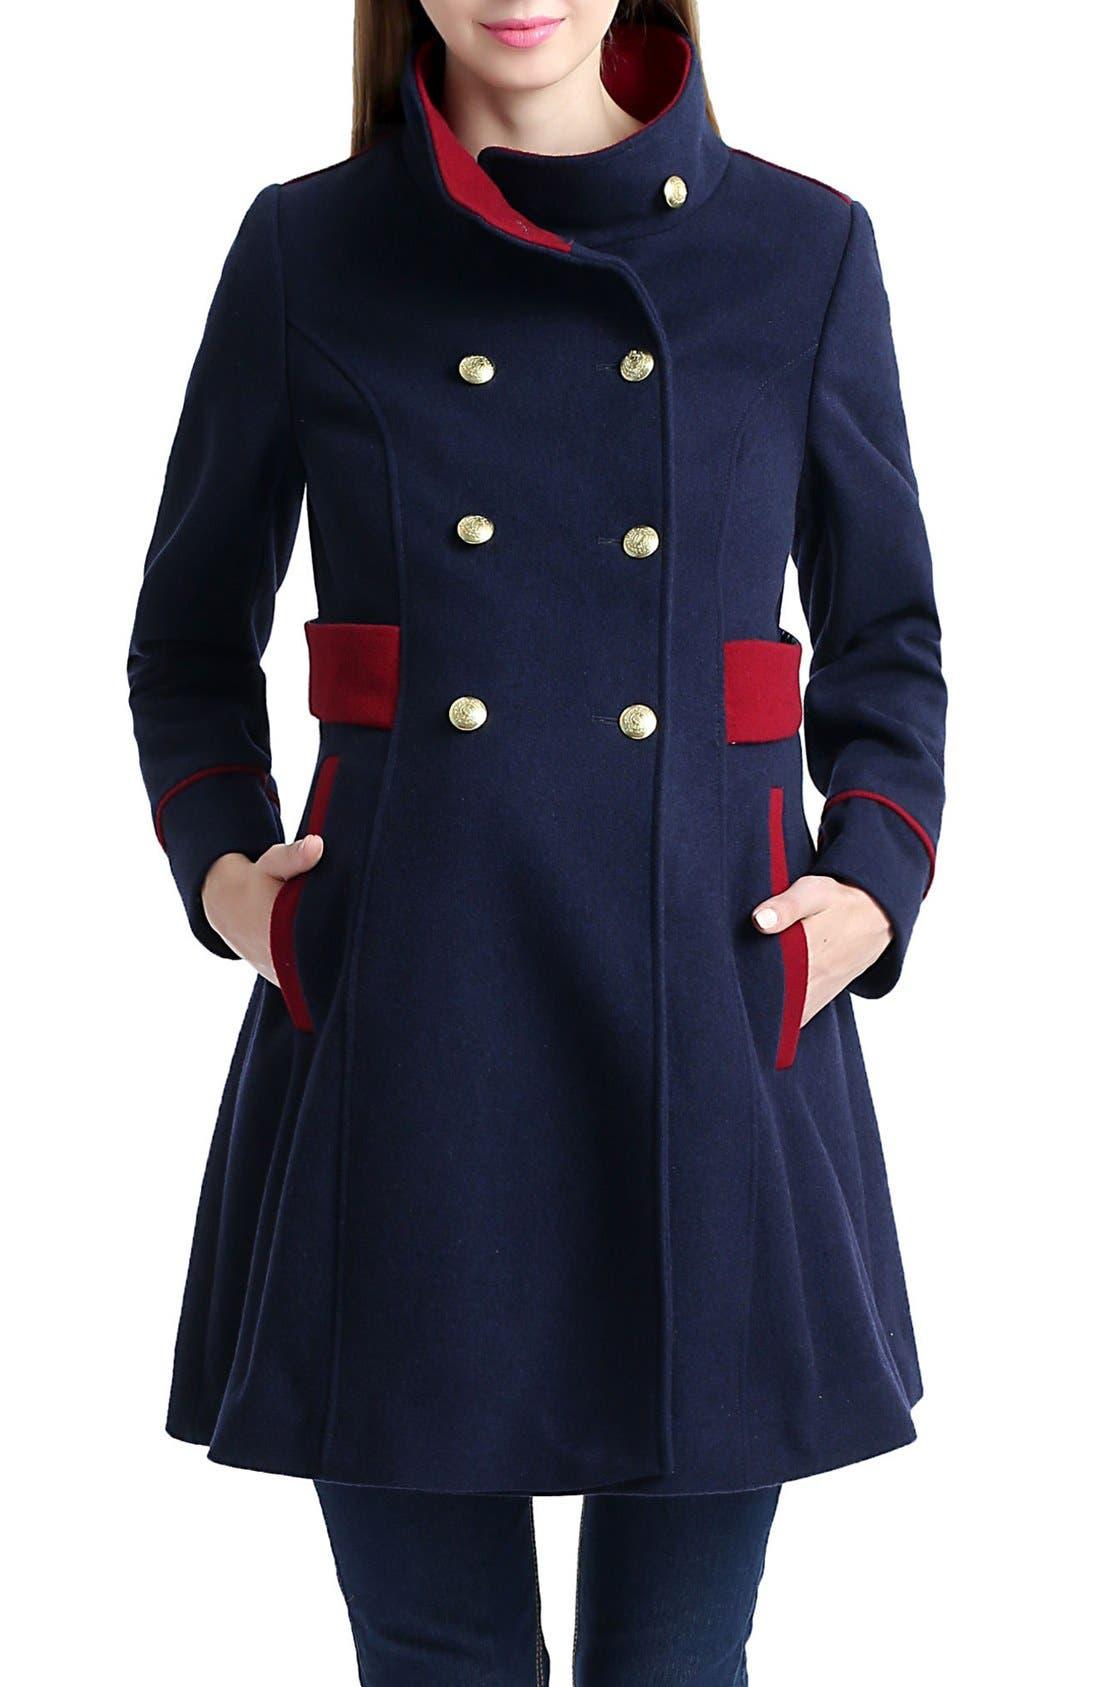 Nom 'Pan' Military Maternity Pea Coat,                         Main,                         color, Navy